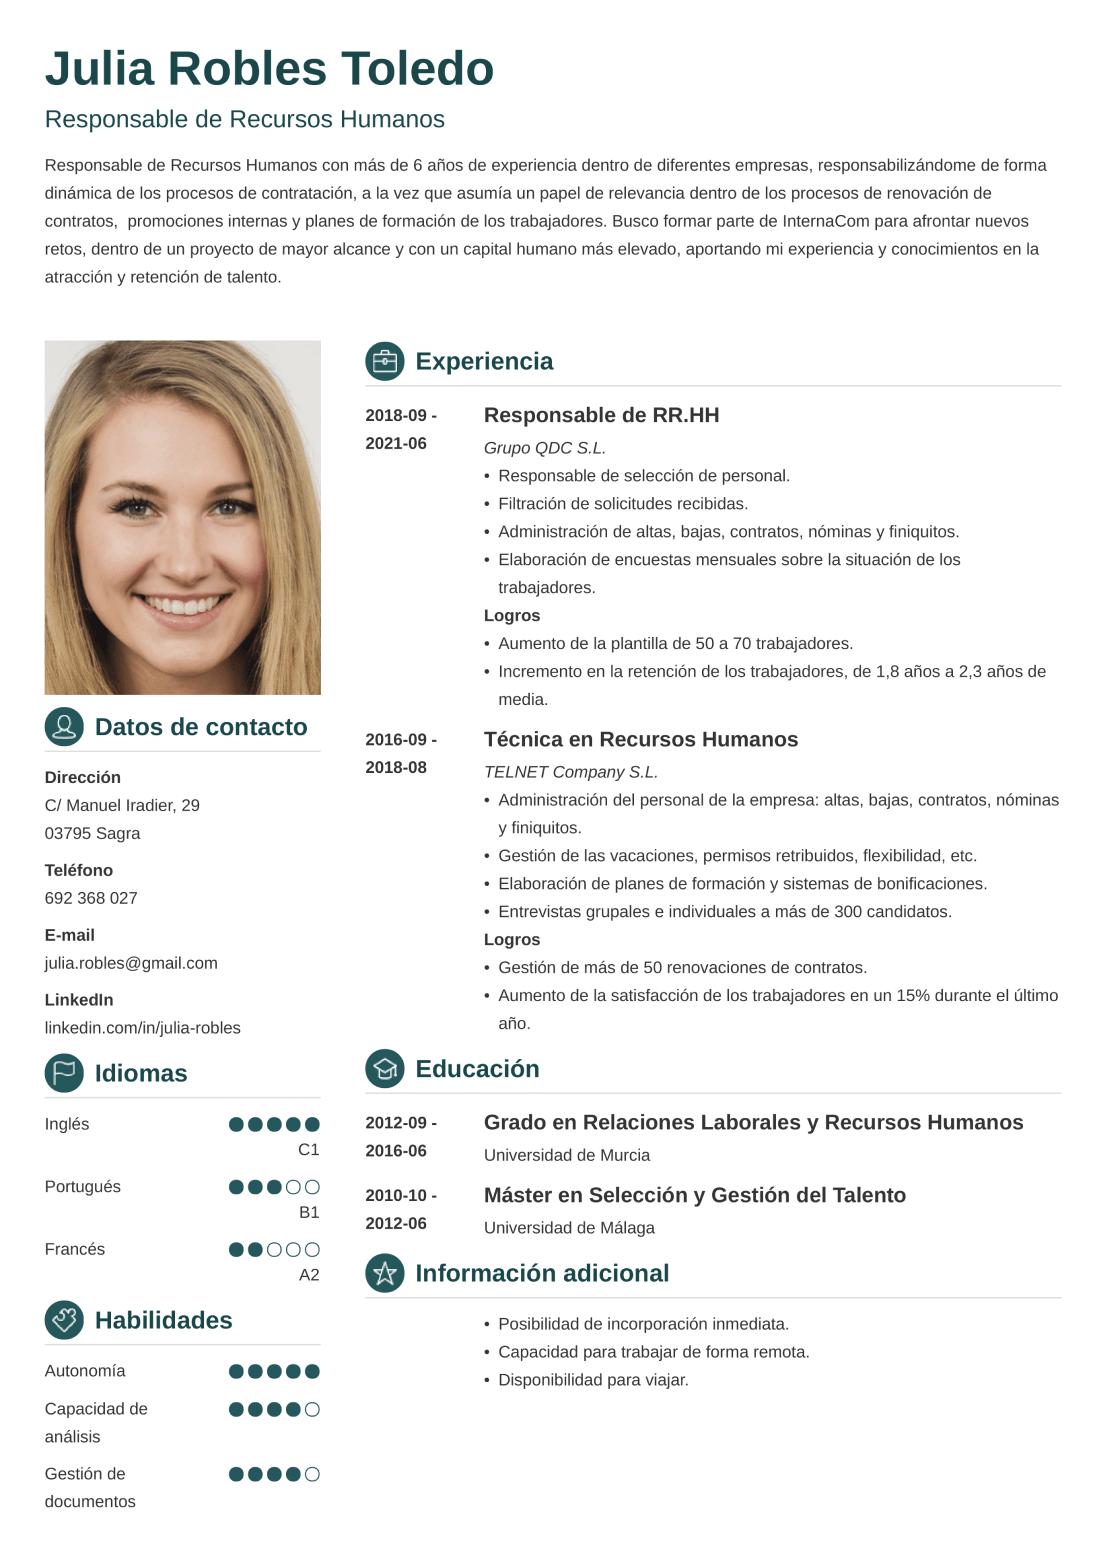 CV online crisp